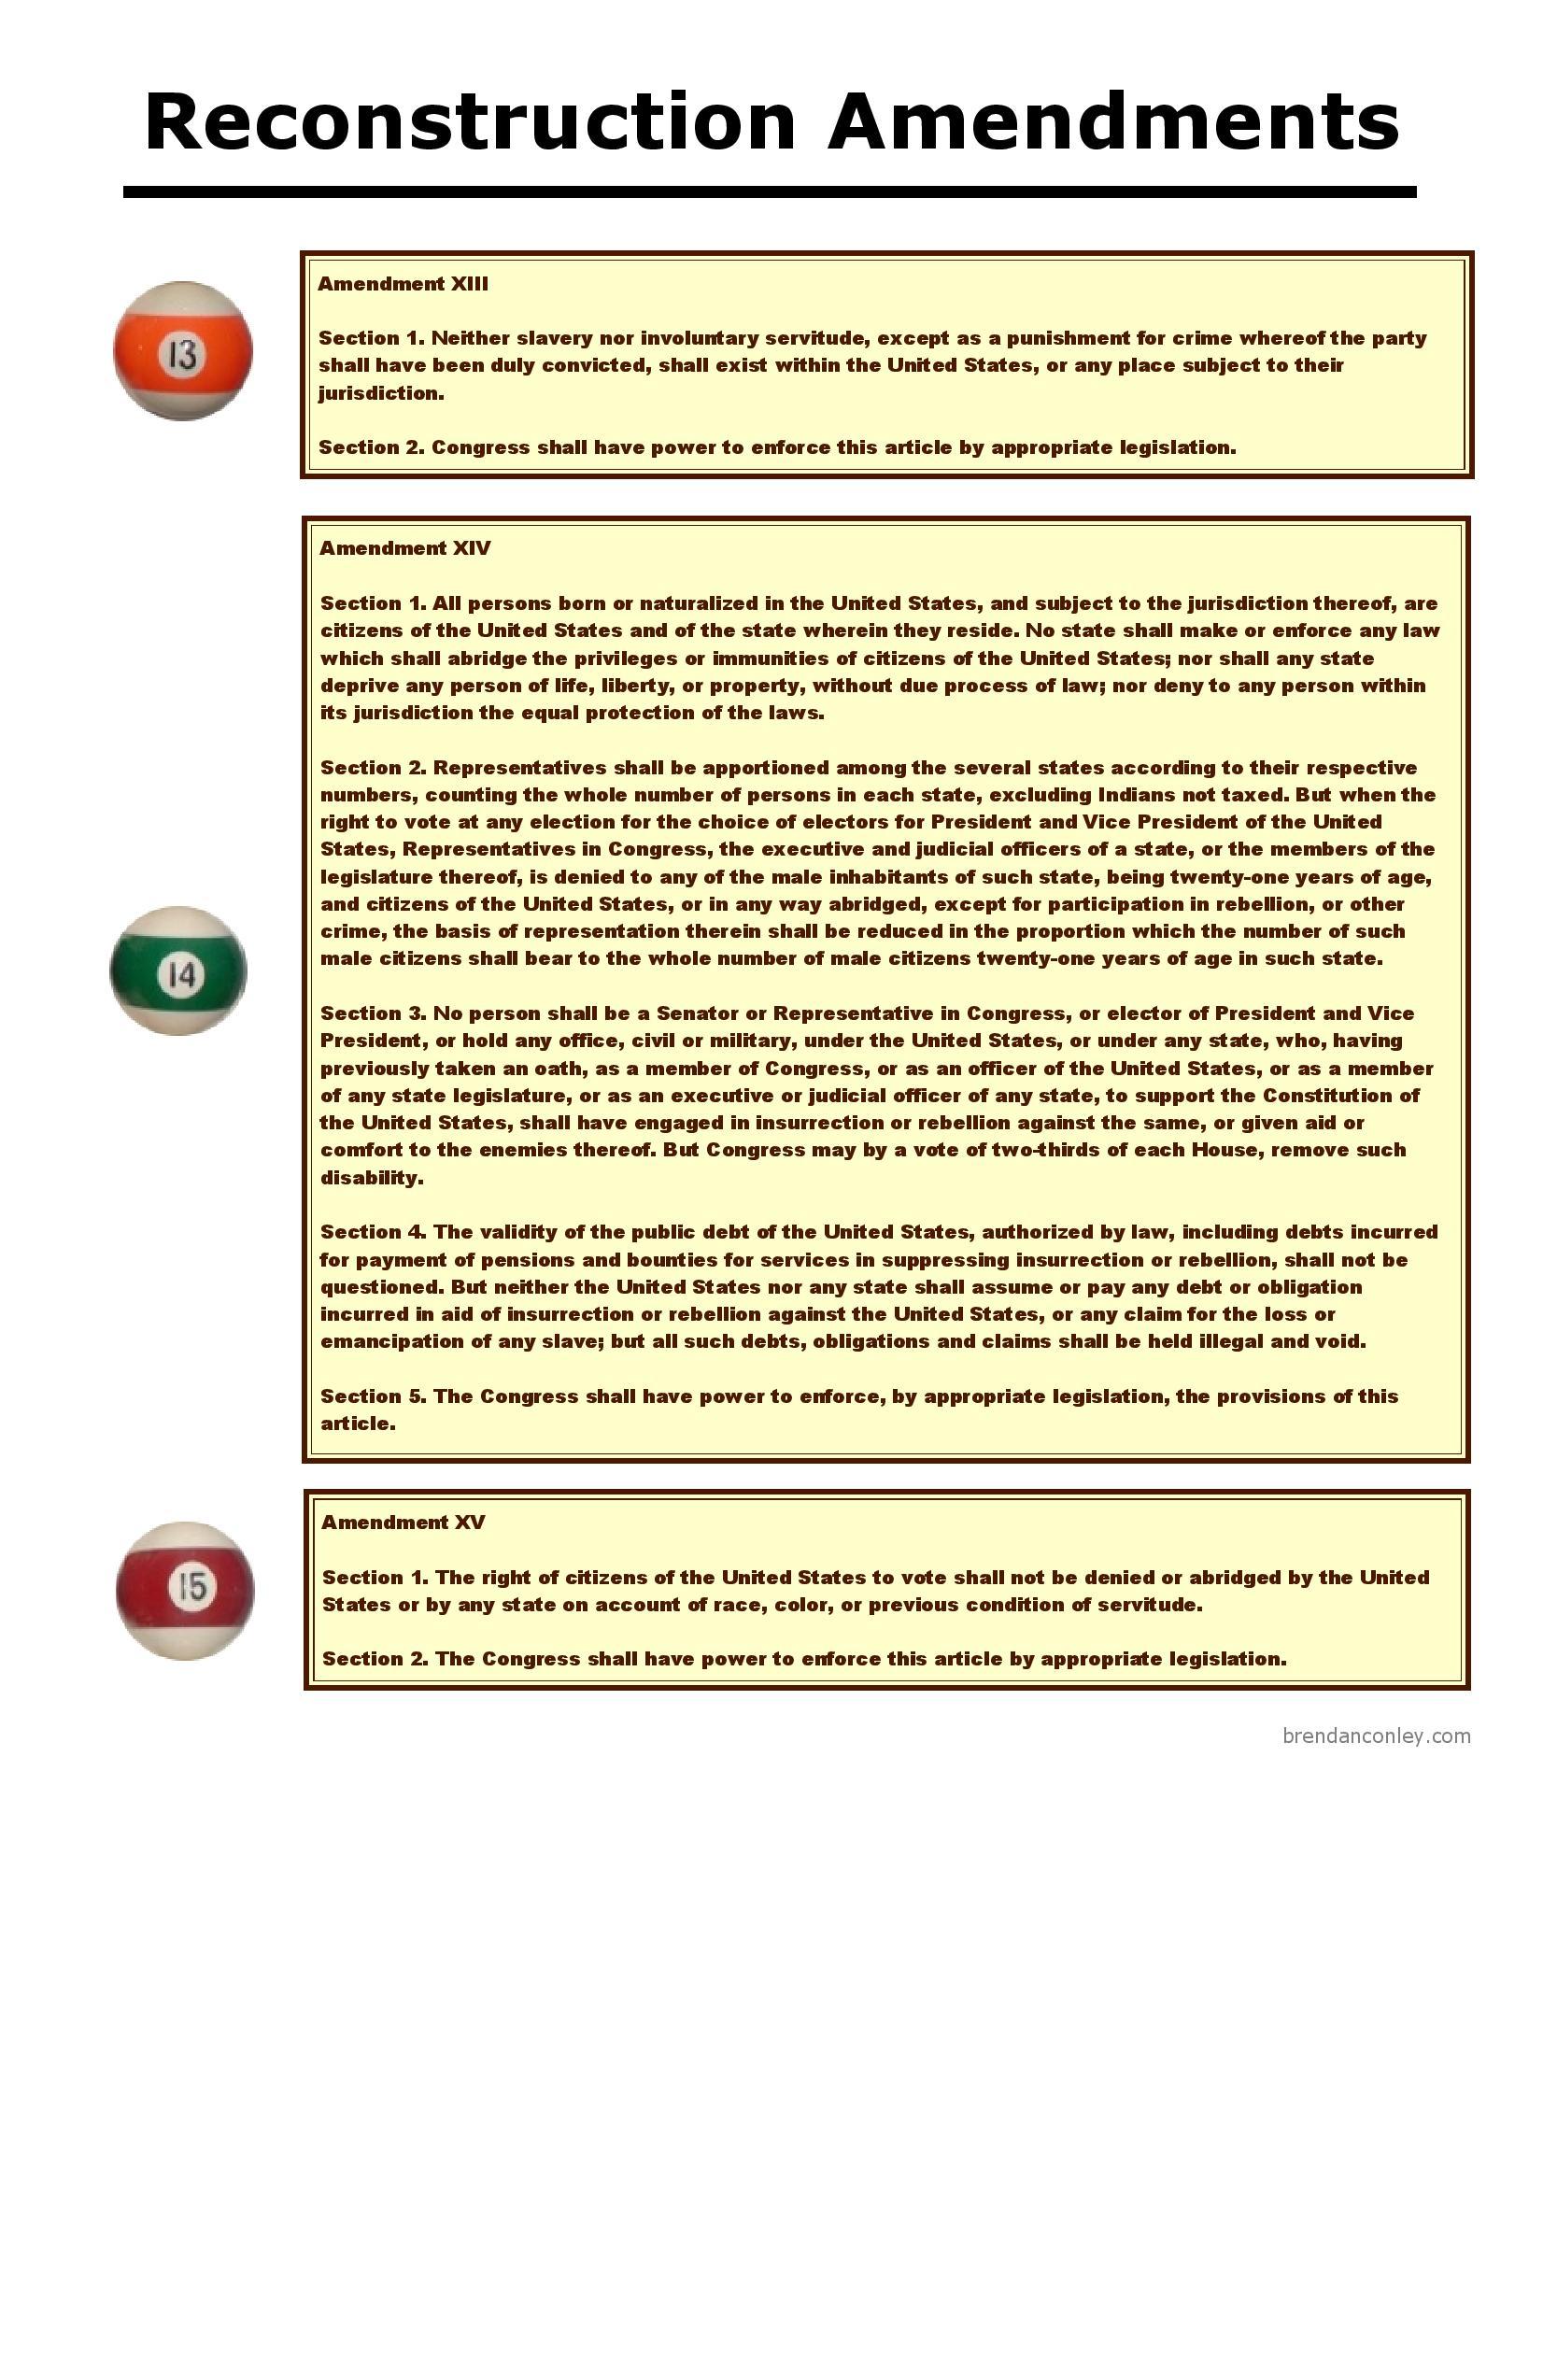 Bill of Rights and Reconstruction Amendments - Bar Exam Study ...